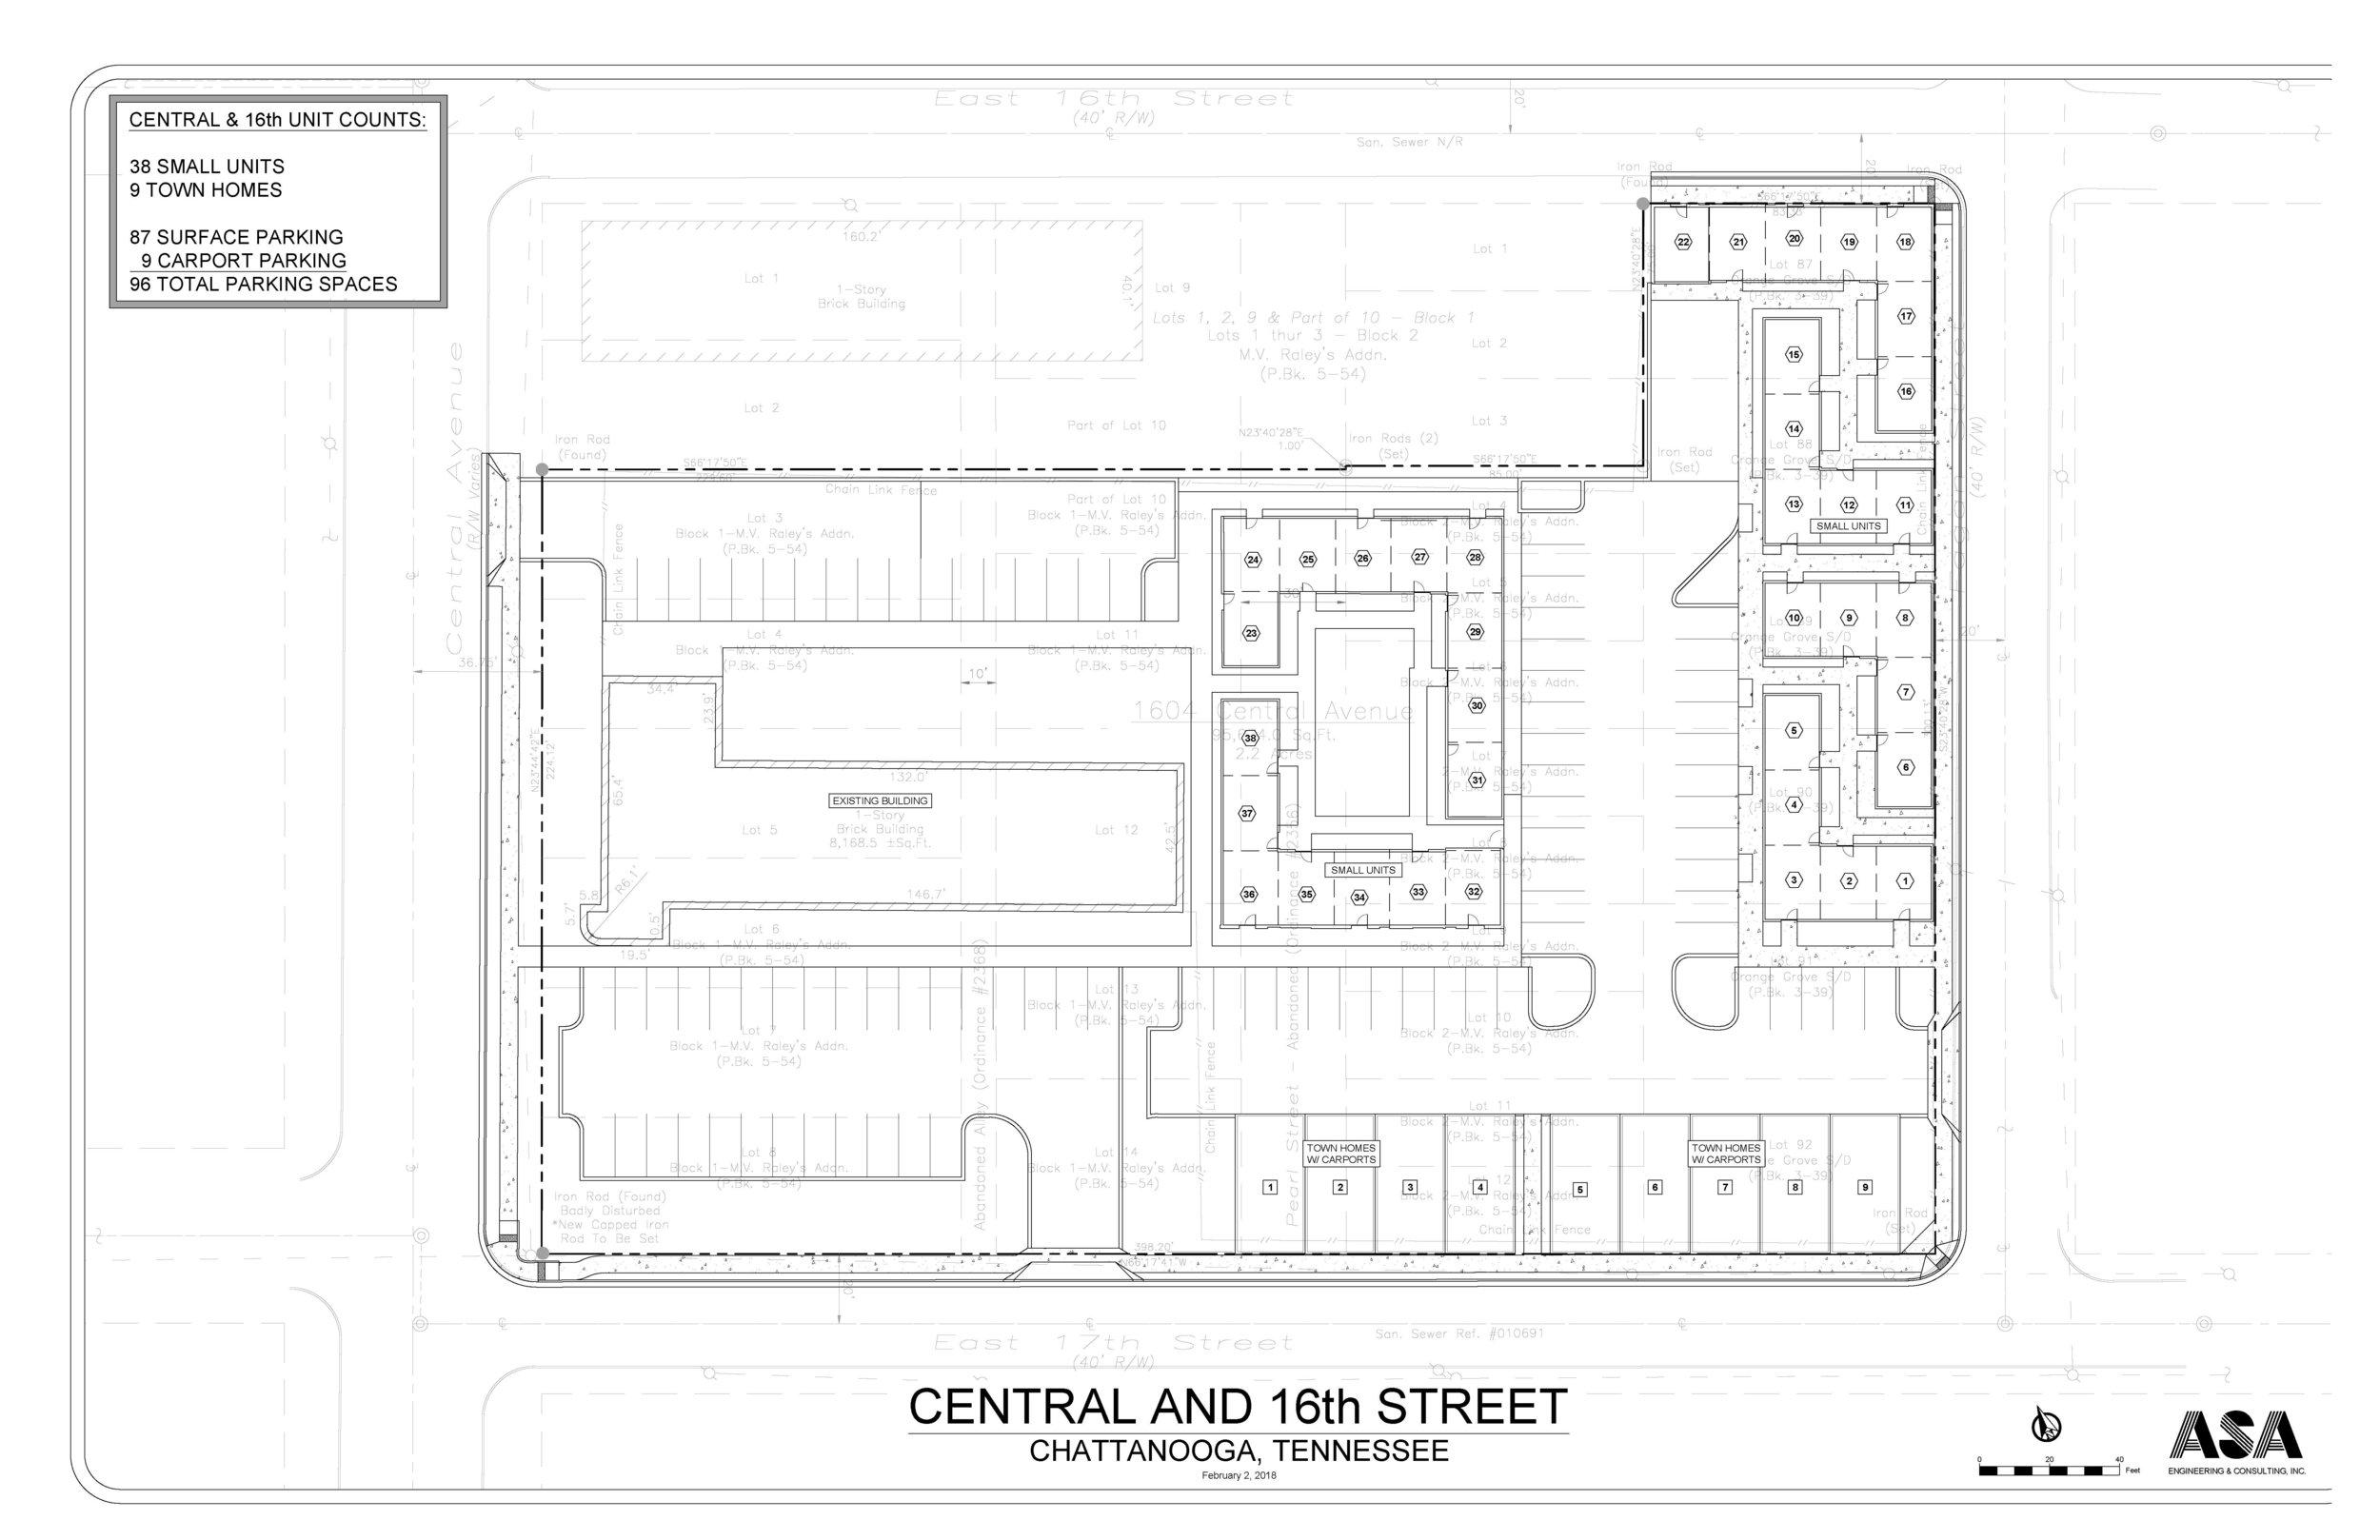 2018-02-02_Conceptual Site Plan.jpg